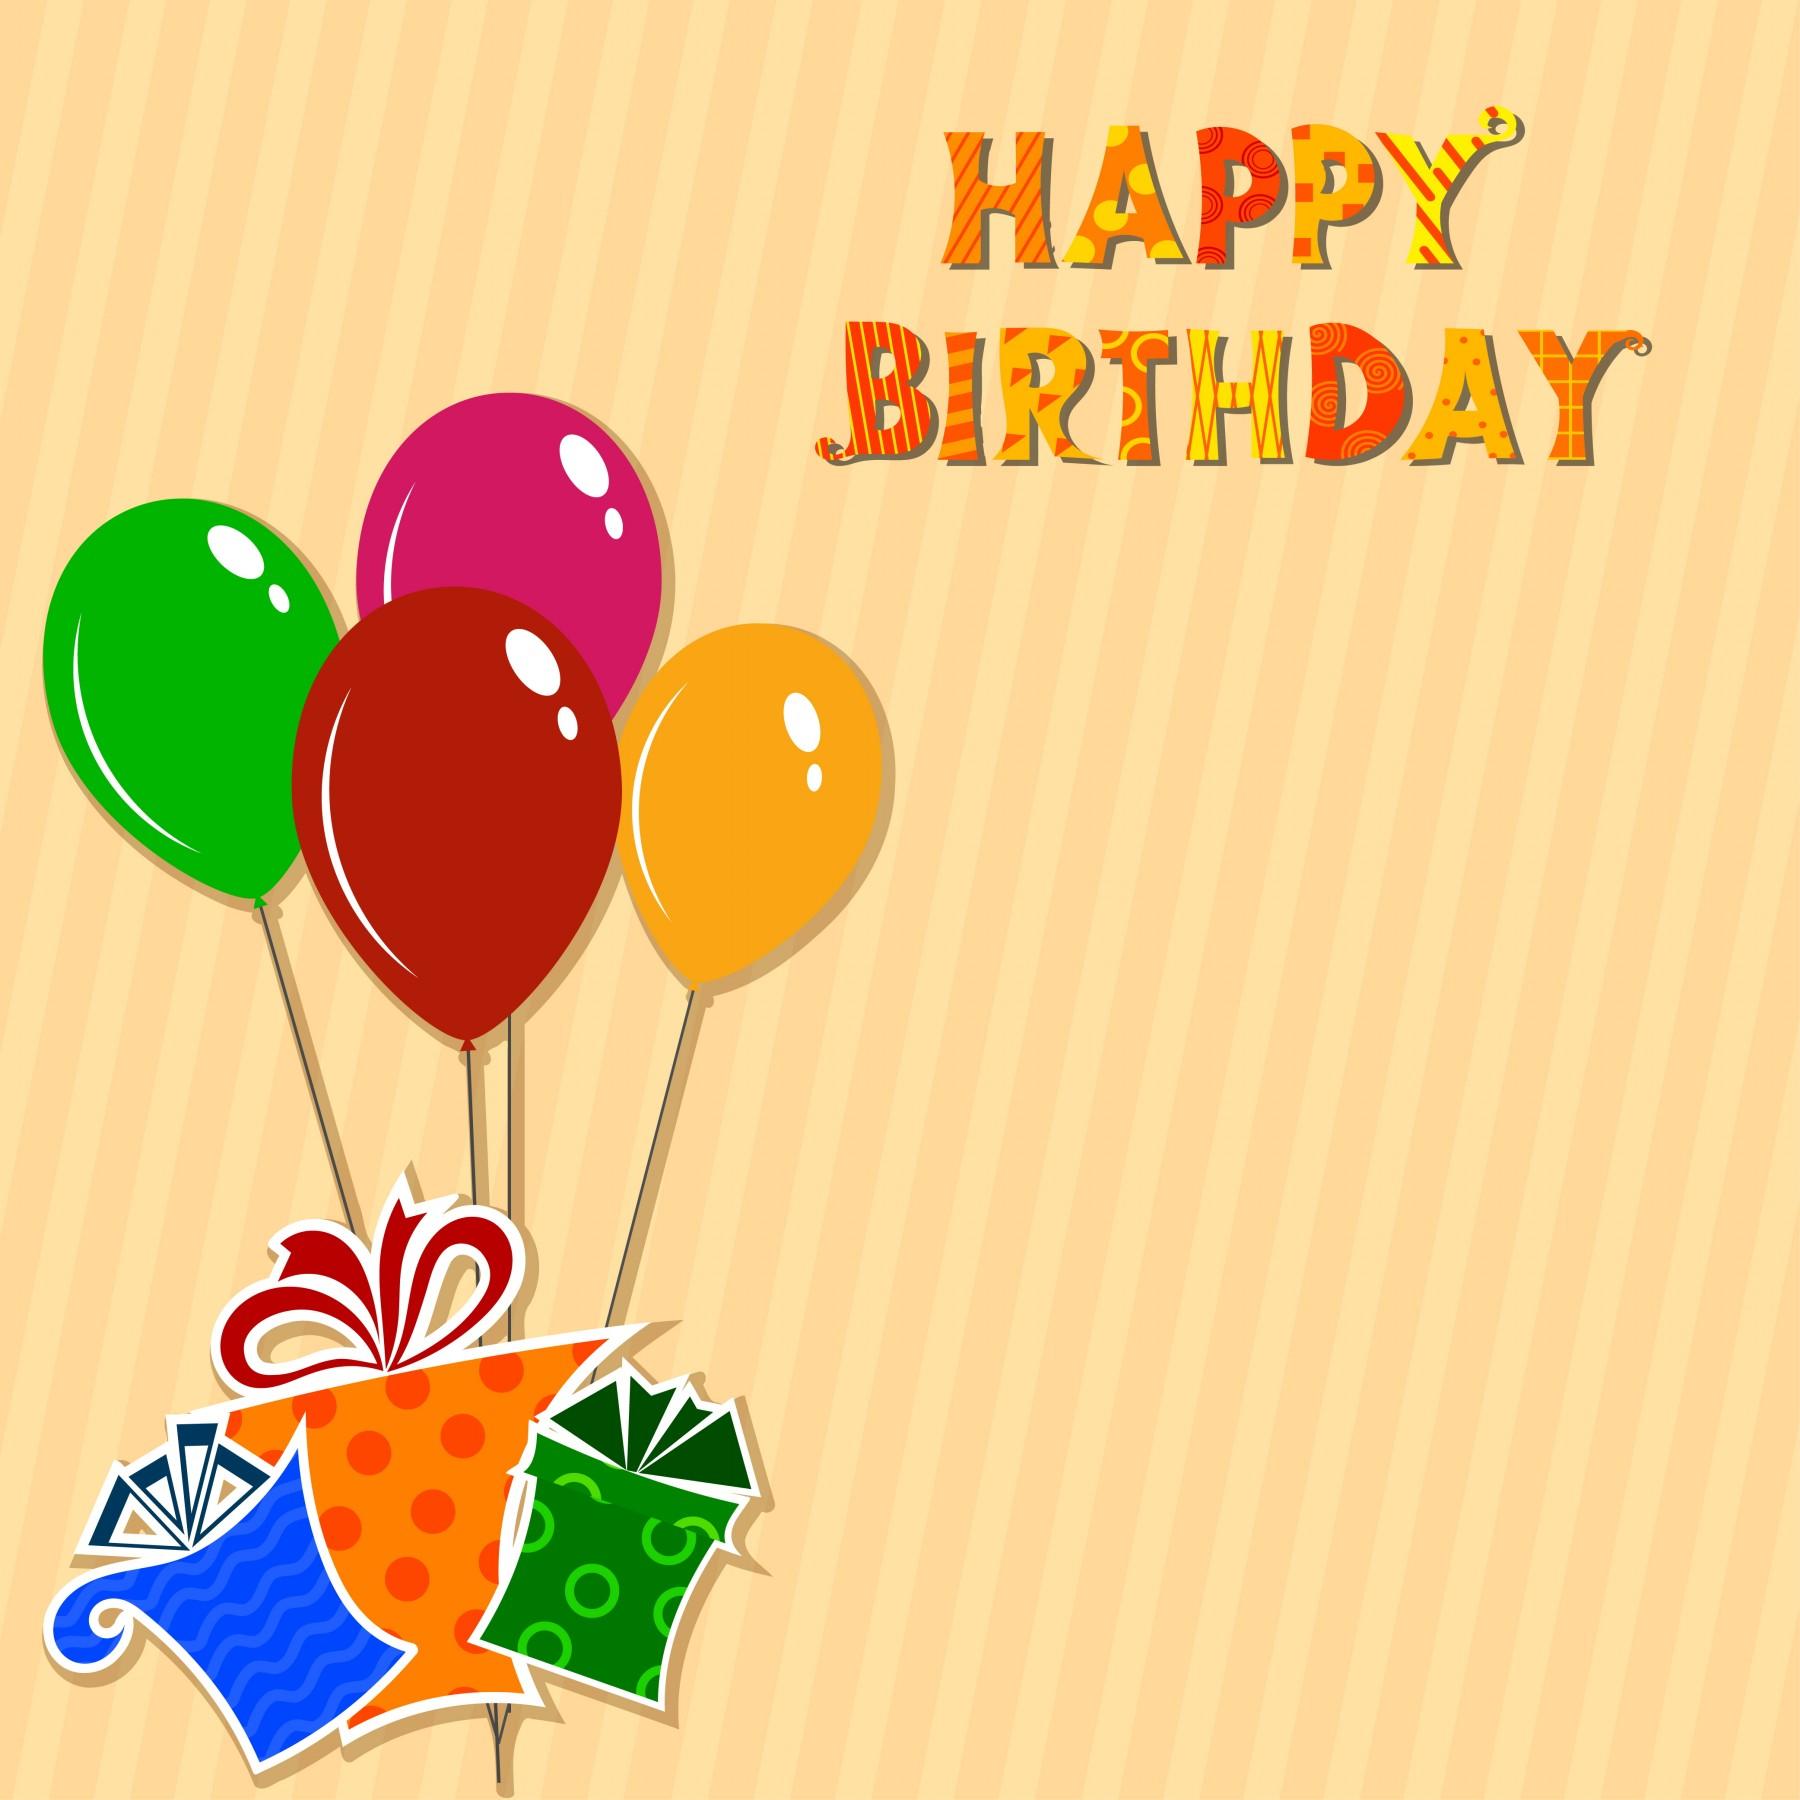 Ultraman birthday cake birthday cake and birthday decoration ideas birthday background striped background with stopboris Images